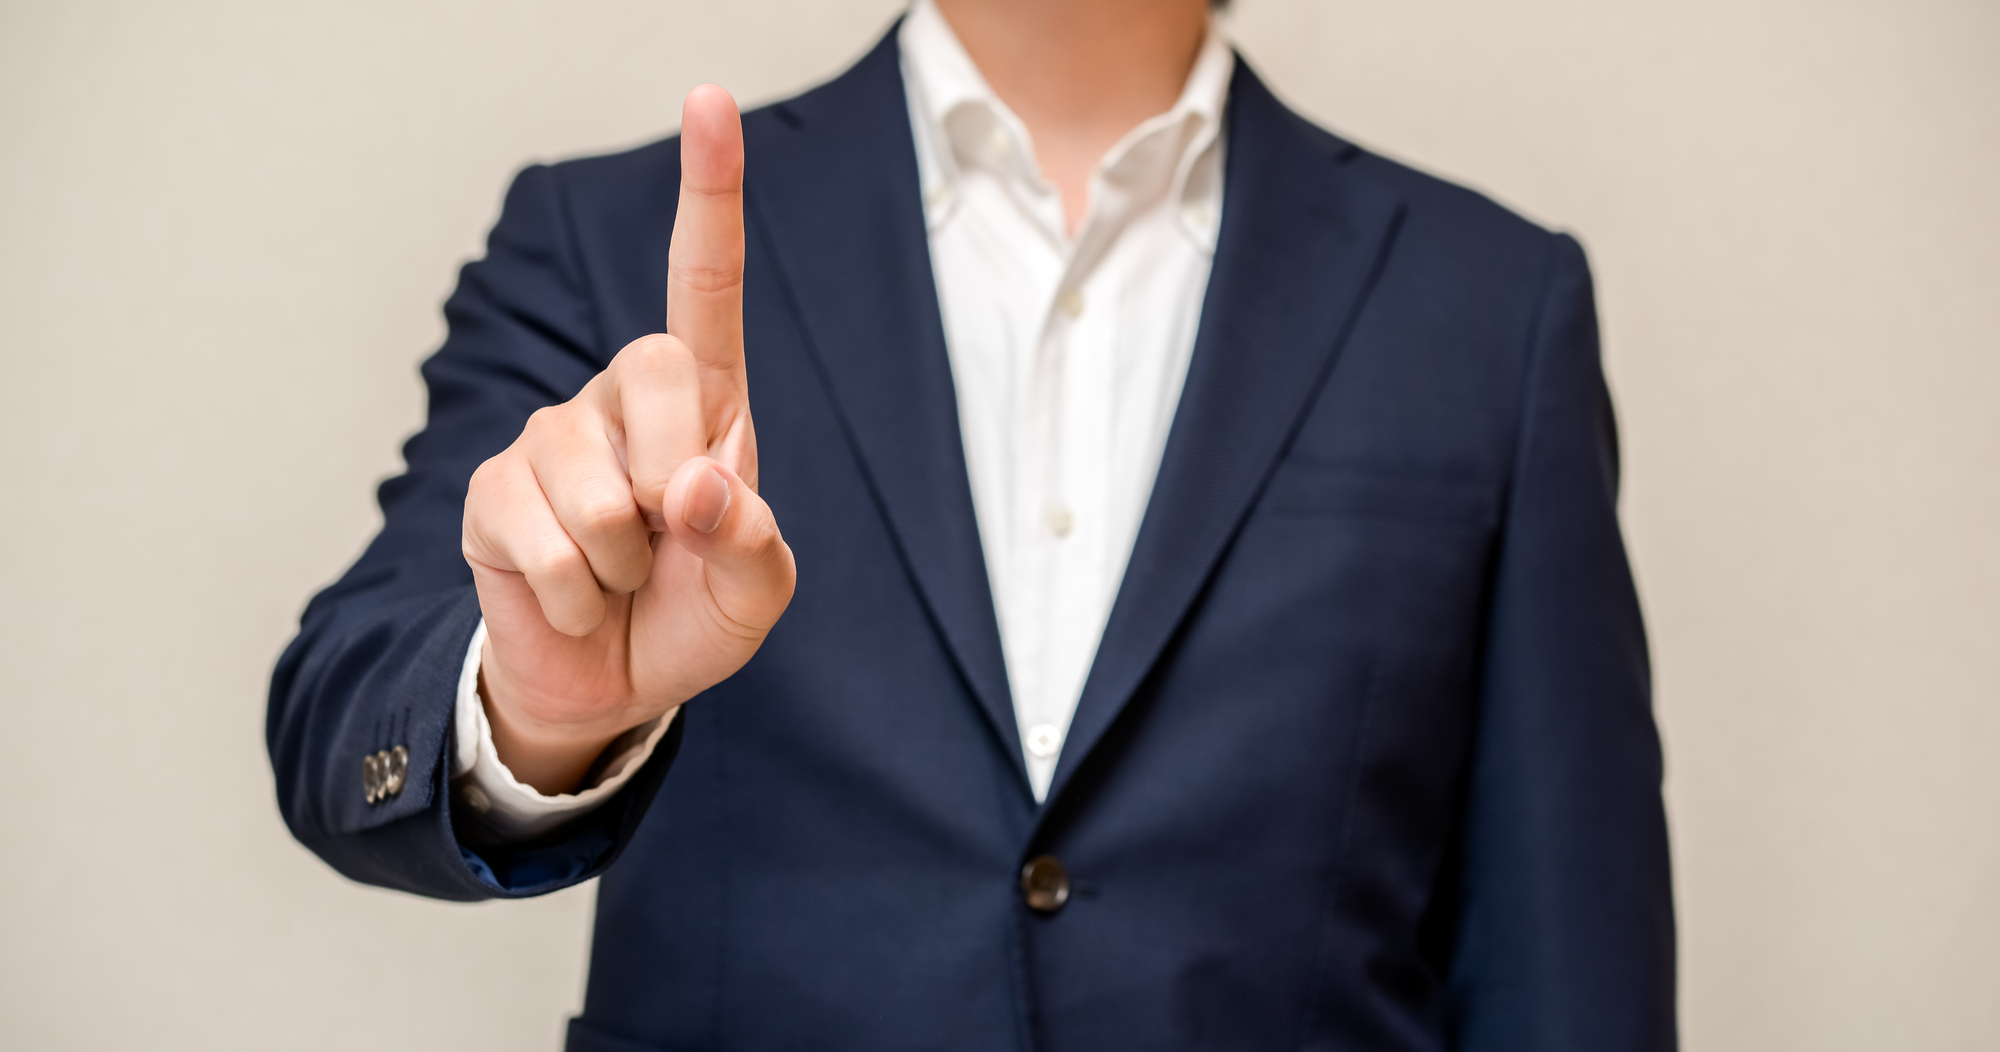 "<span class=""title"">転職エージェントに登録や求人紹介を断られるのはなぜ?その理由と対処法</span>"